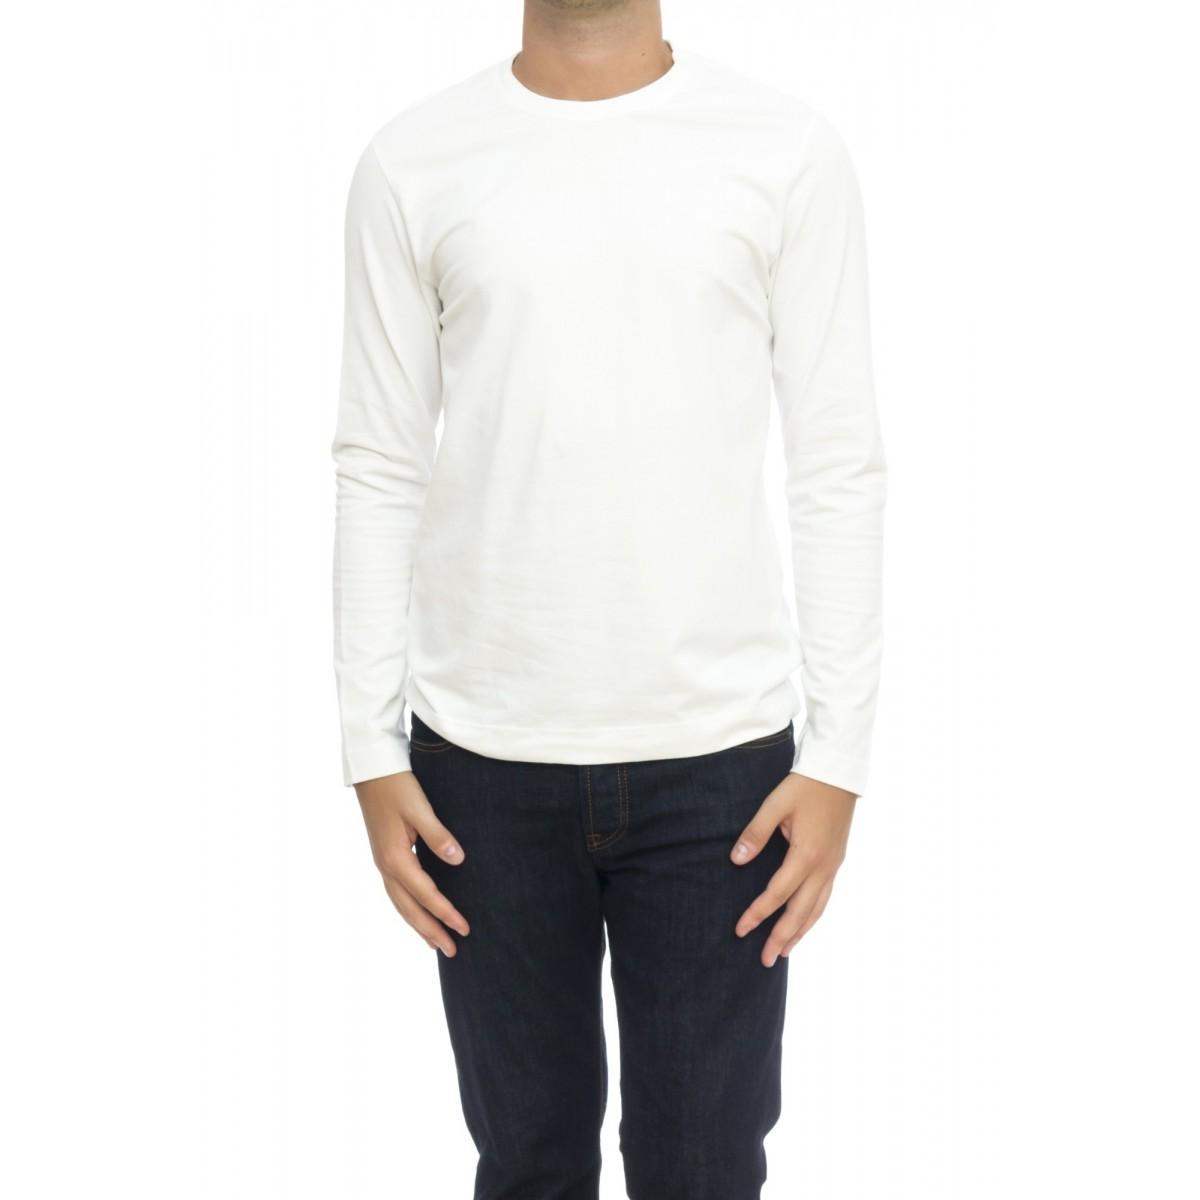 T shirt manica lunga - Cn2034 tshirt manica lunga jersey